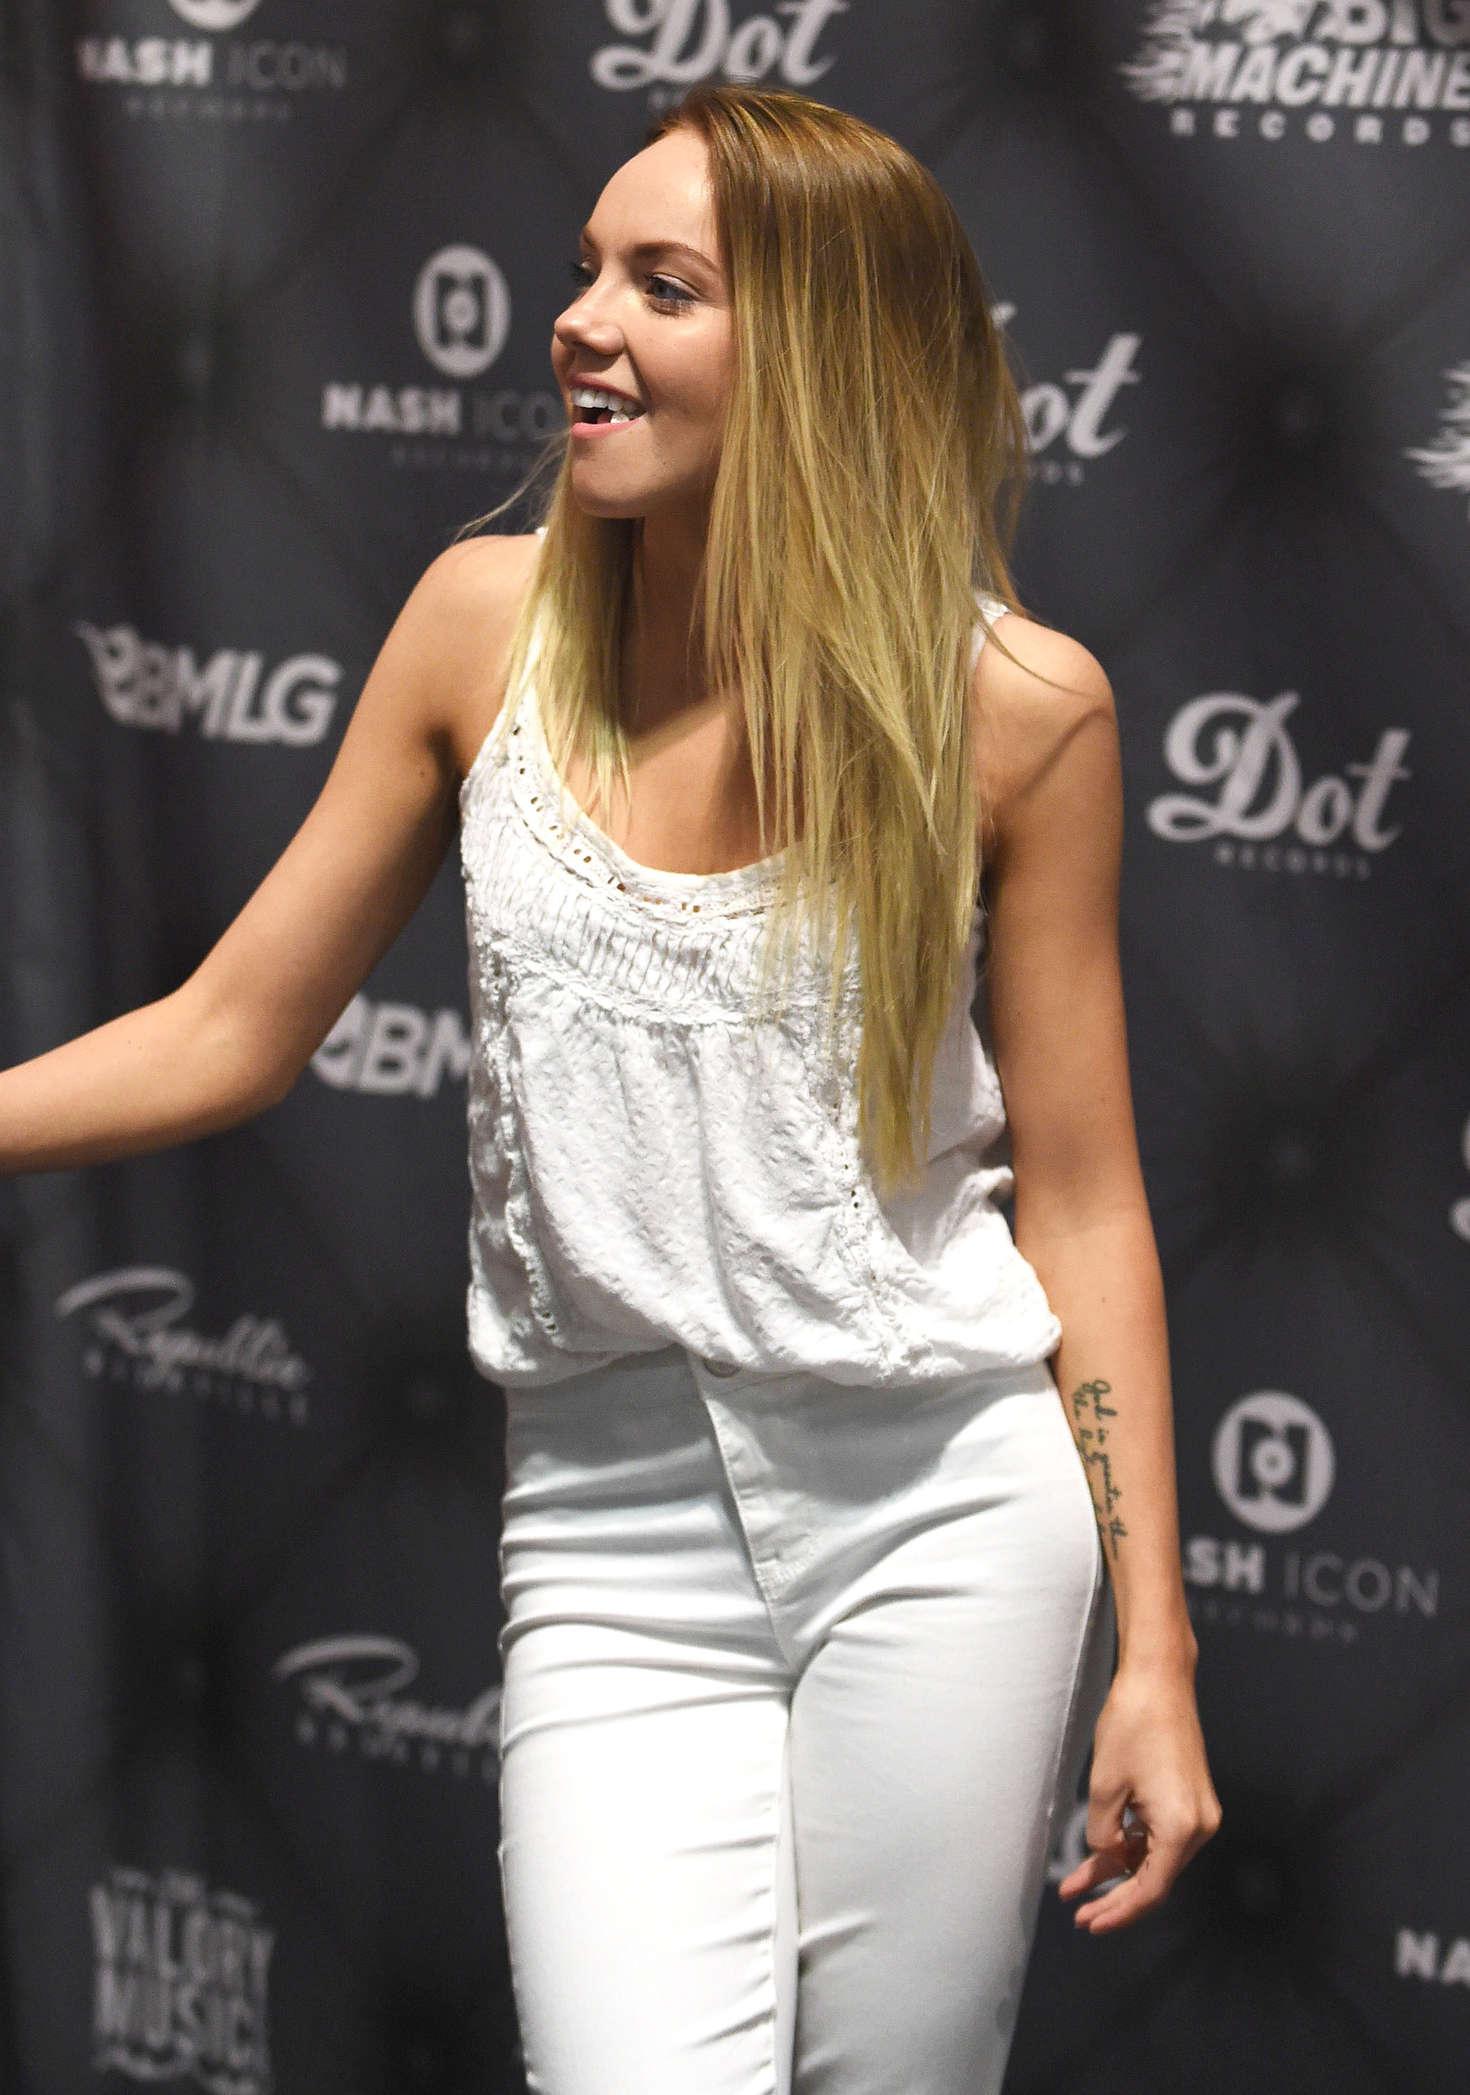 Danielle Bradbery Legs >> Danielle Bradbery: 2016 CMA Music Festival Nightly Concert -04 - GotCeleb